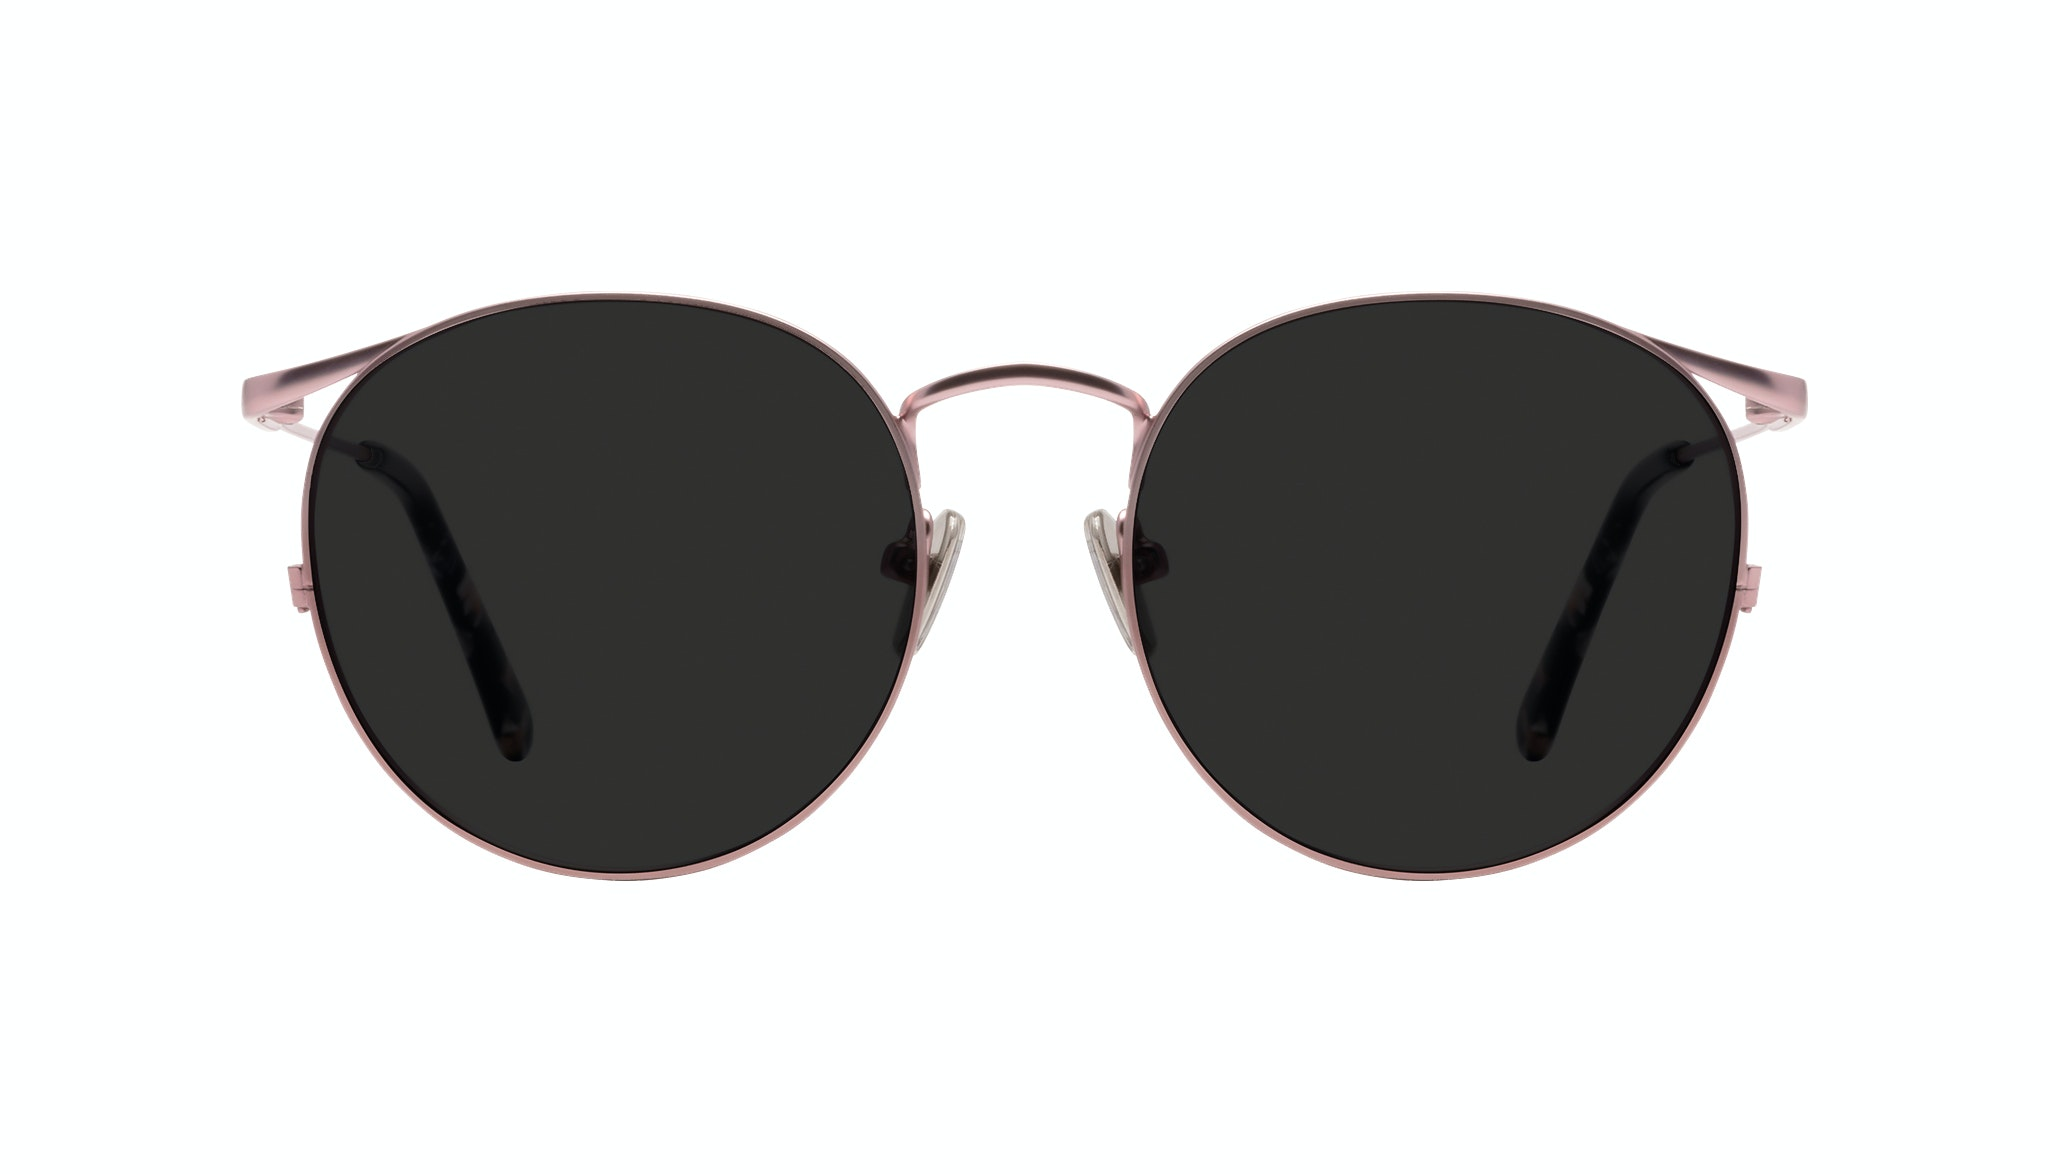 Affordable Fashion Glasses Round Sunglasses Women Curve Blush Front